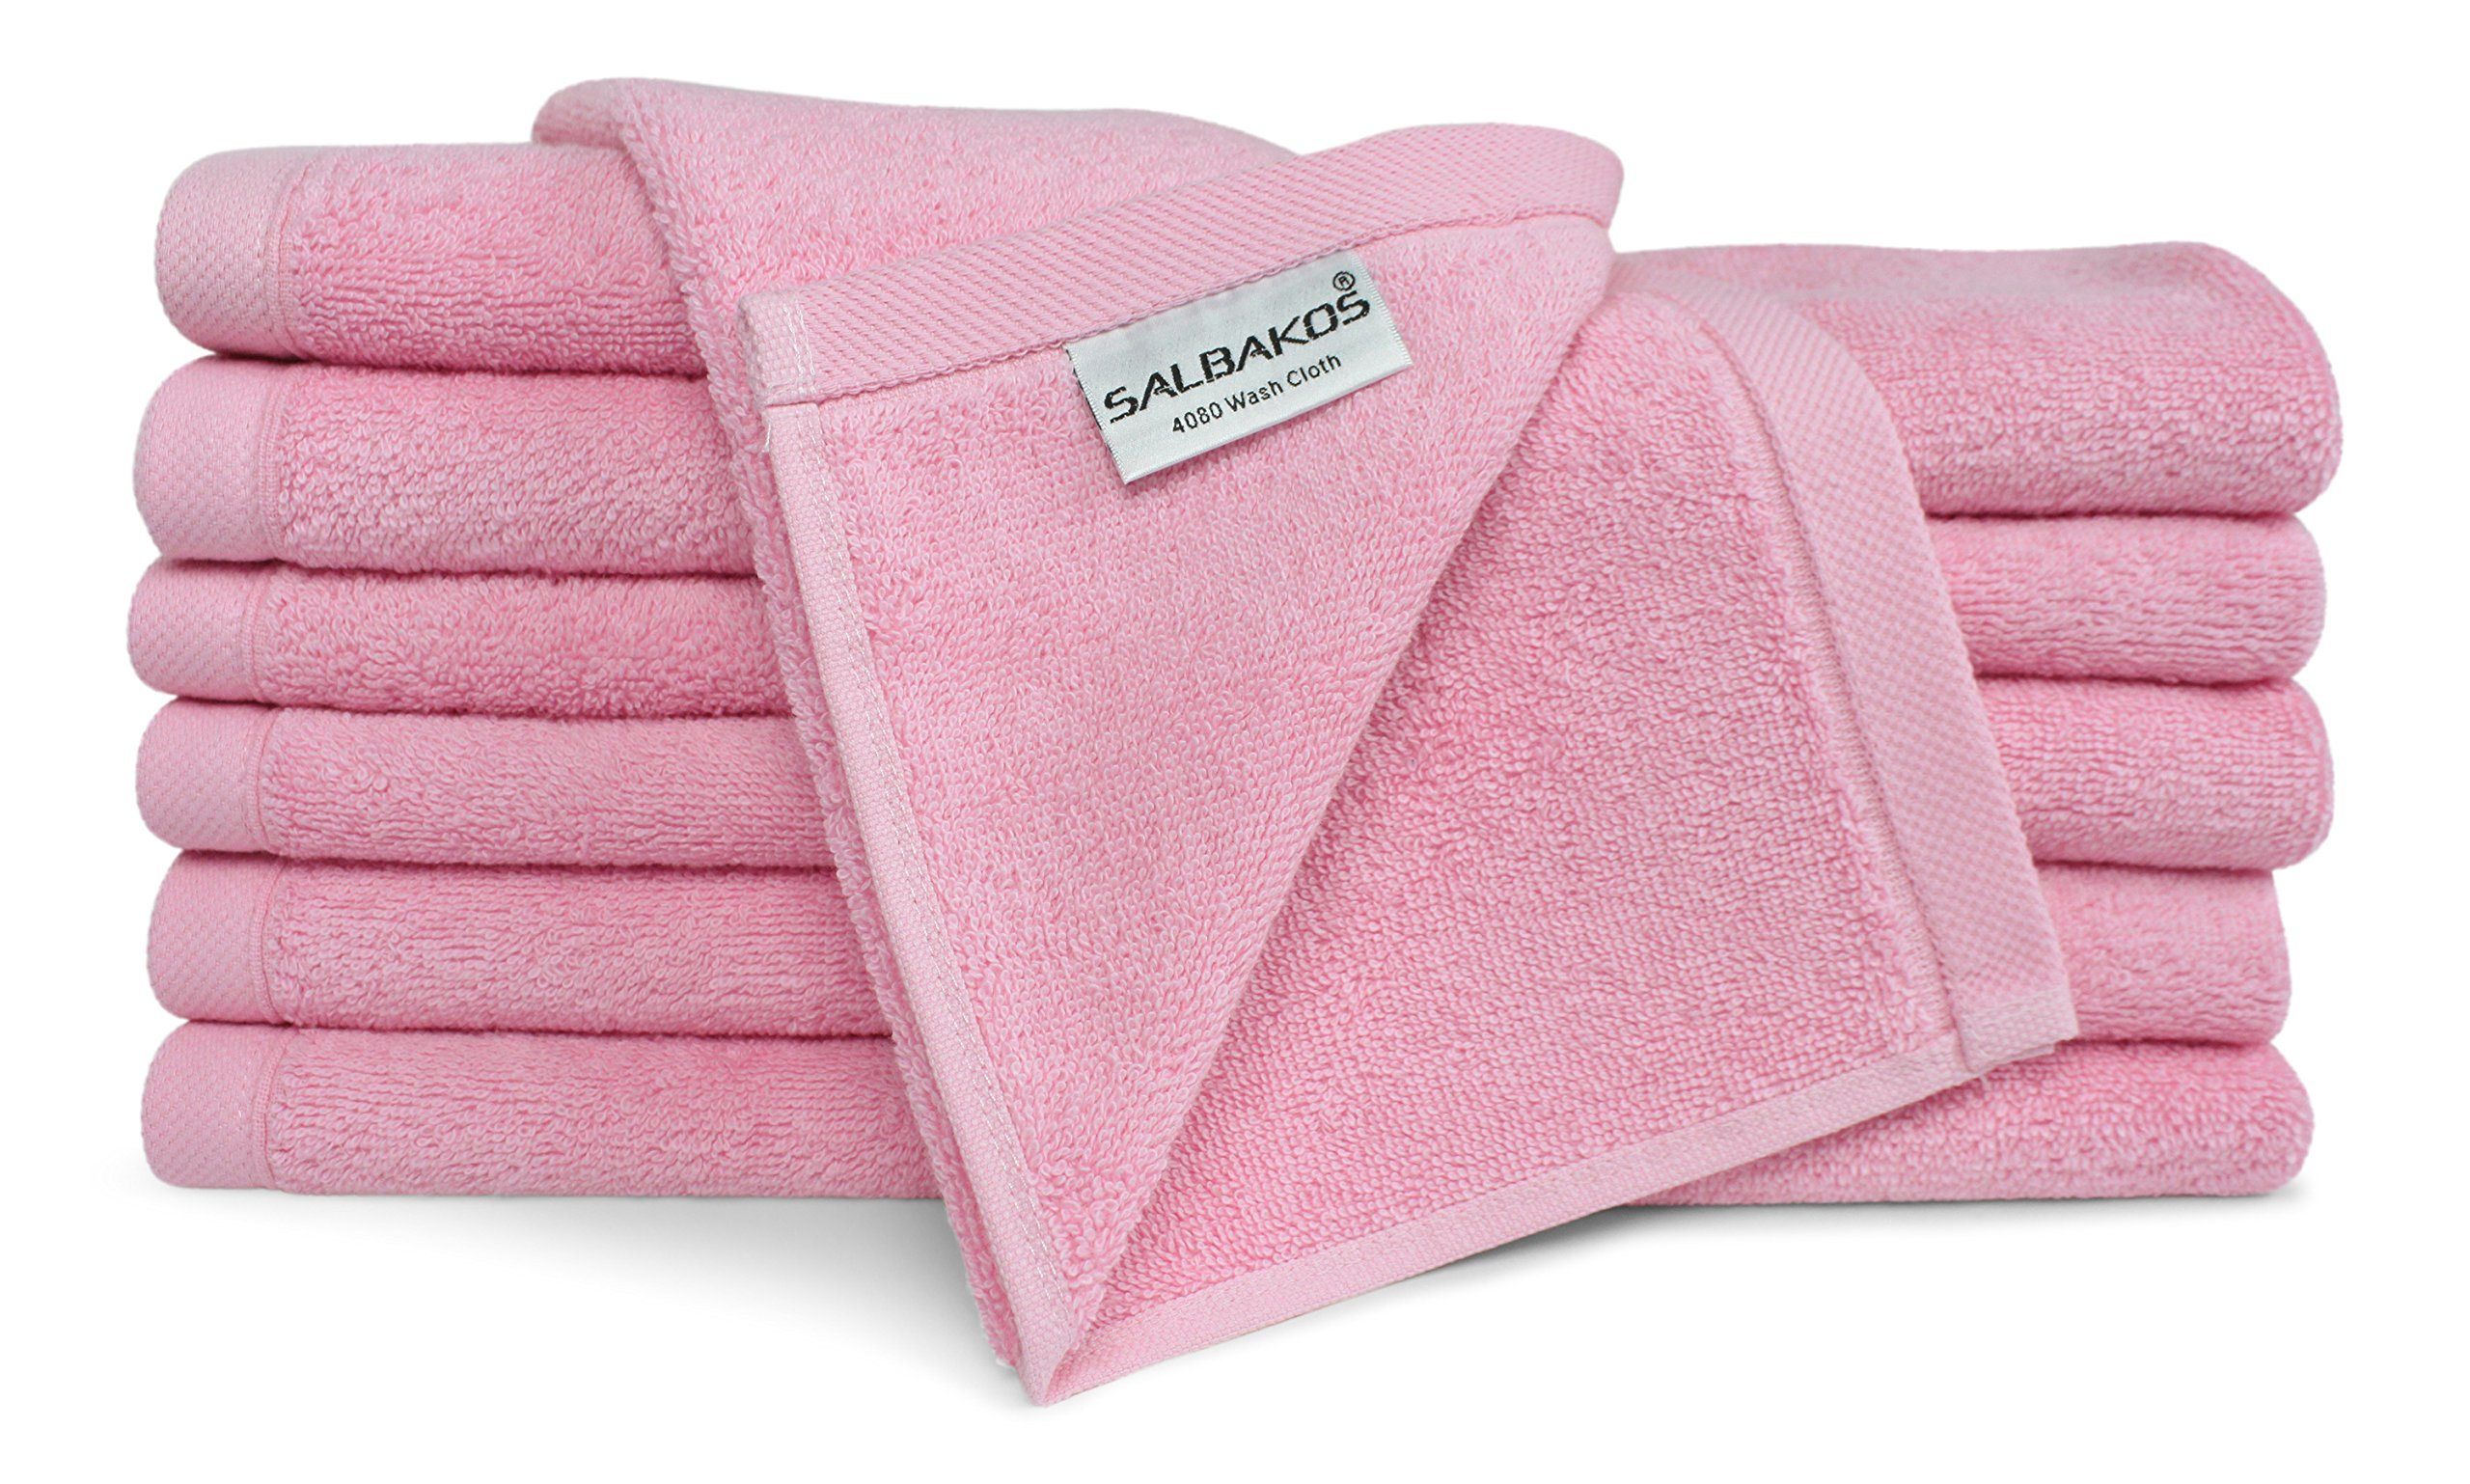 SALBAKOS Luxury Hotel & Spa Turkish Cotton 12-Piece Eco-Friendly Washcloth Set Bath, Rose